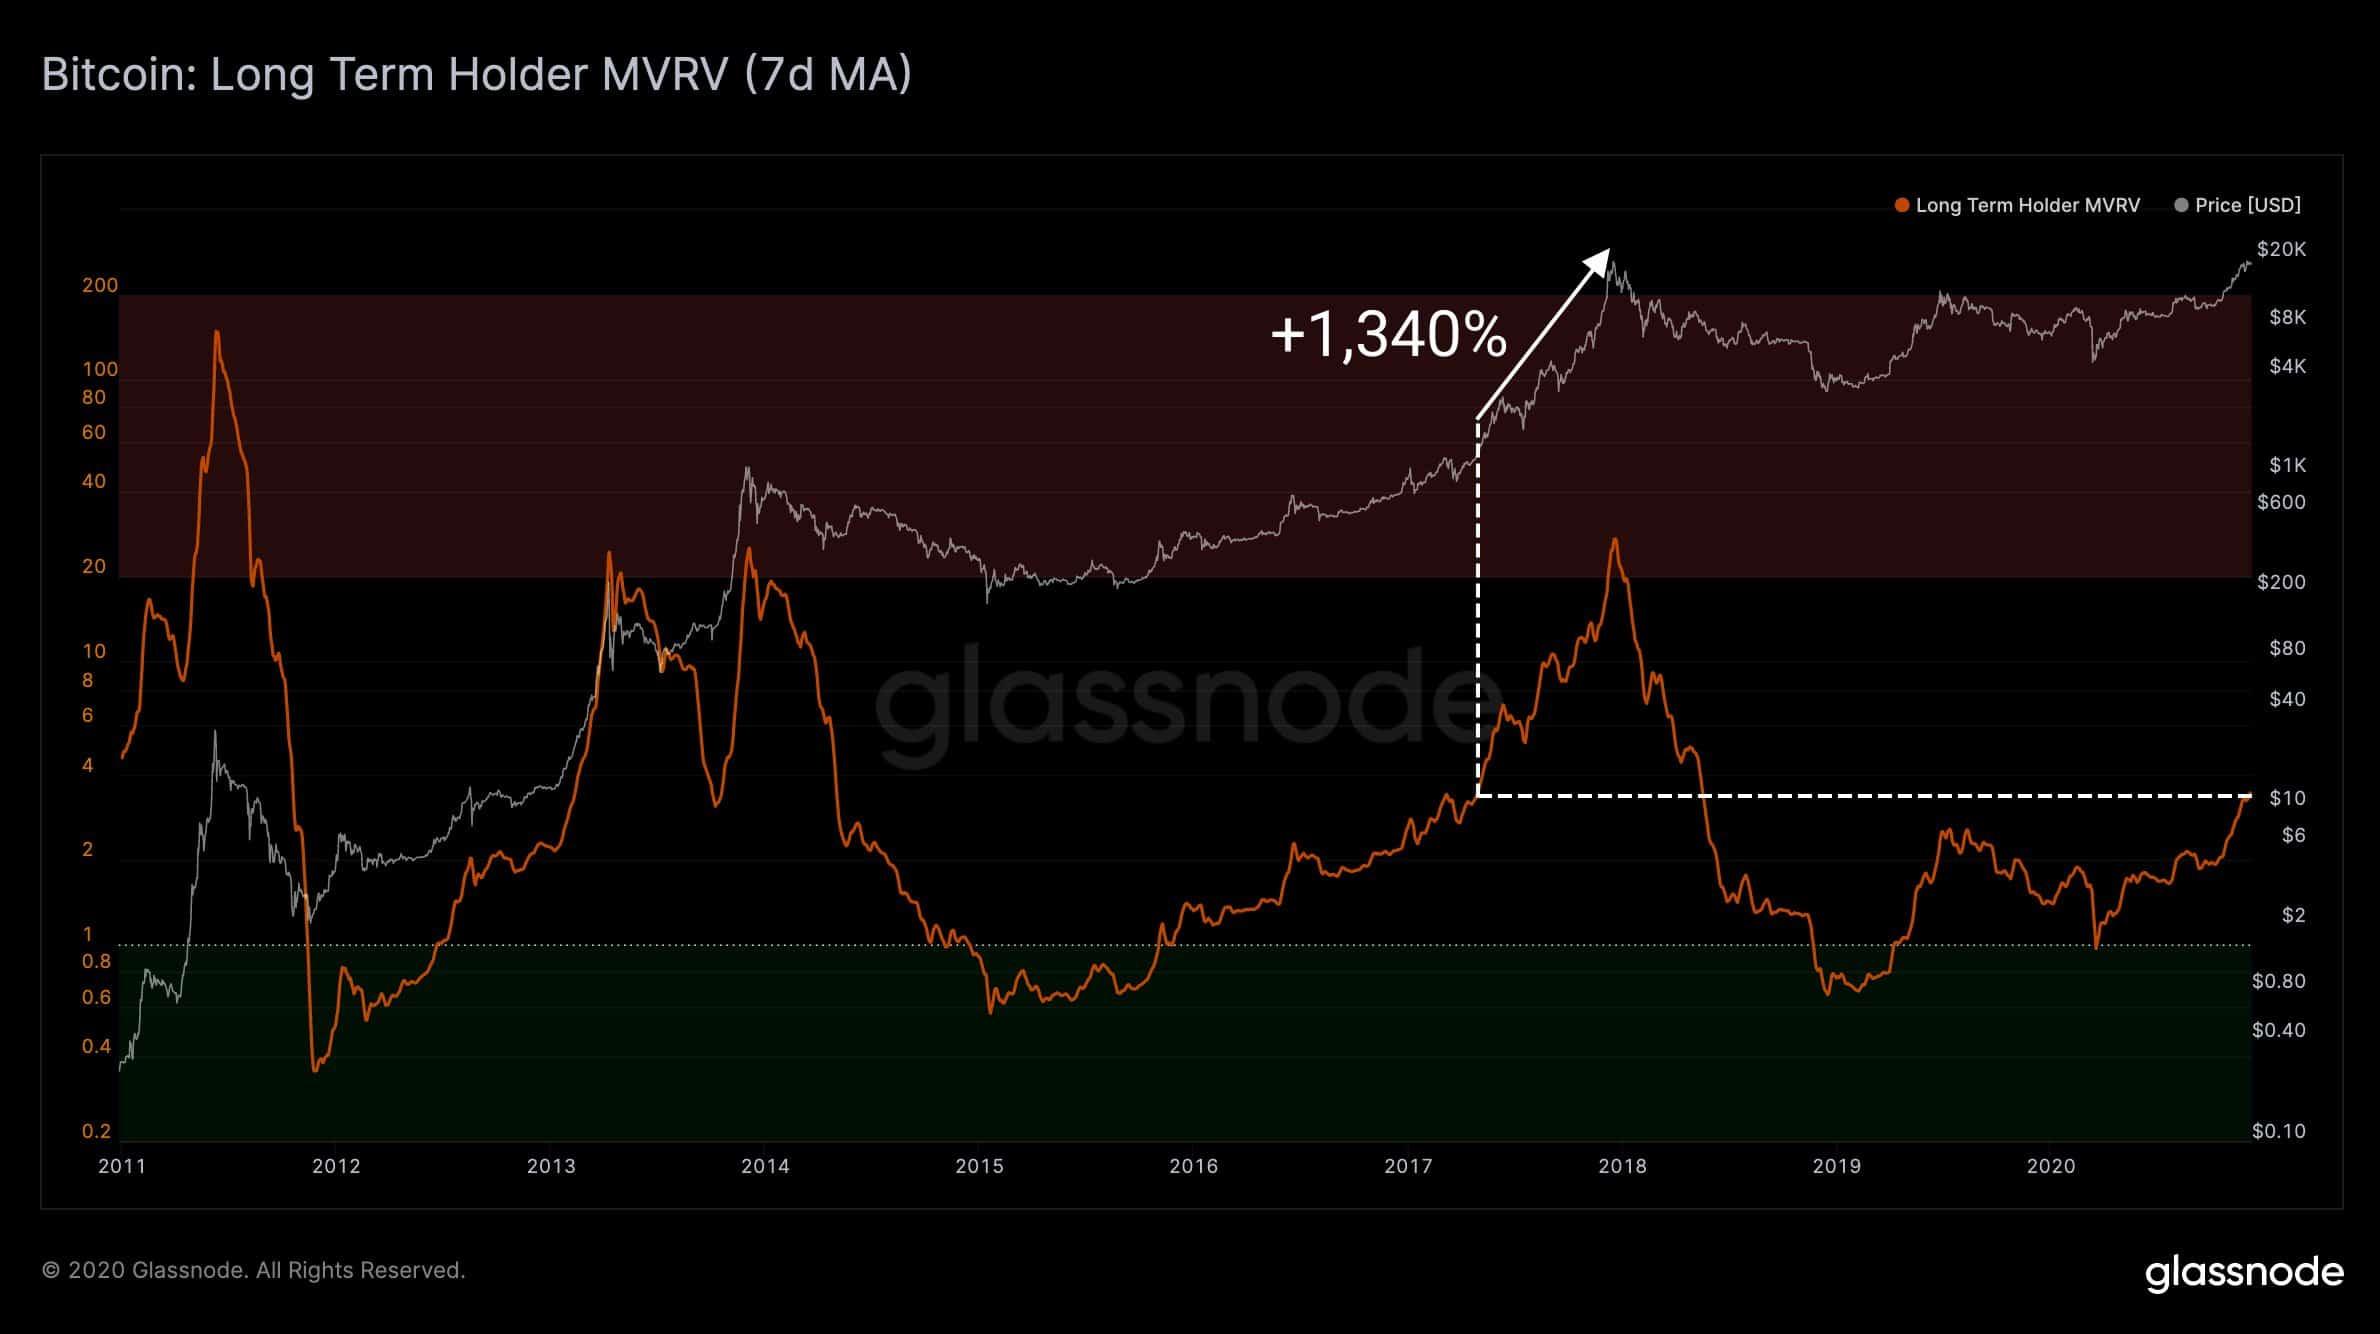 Bitcoin Long Term Holder MVRV. Source: Glassnode